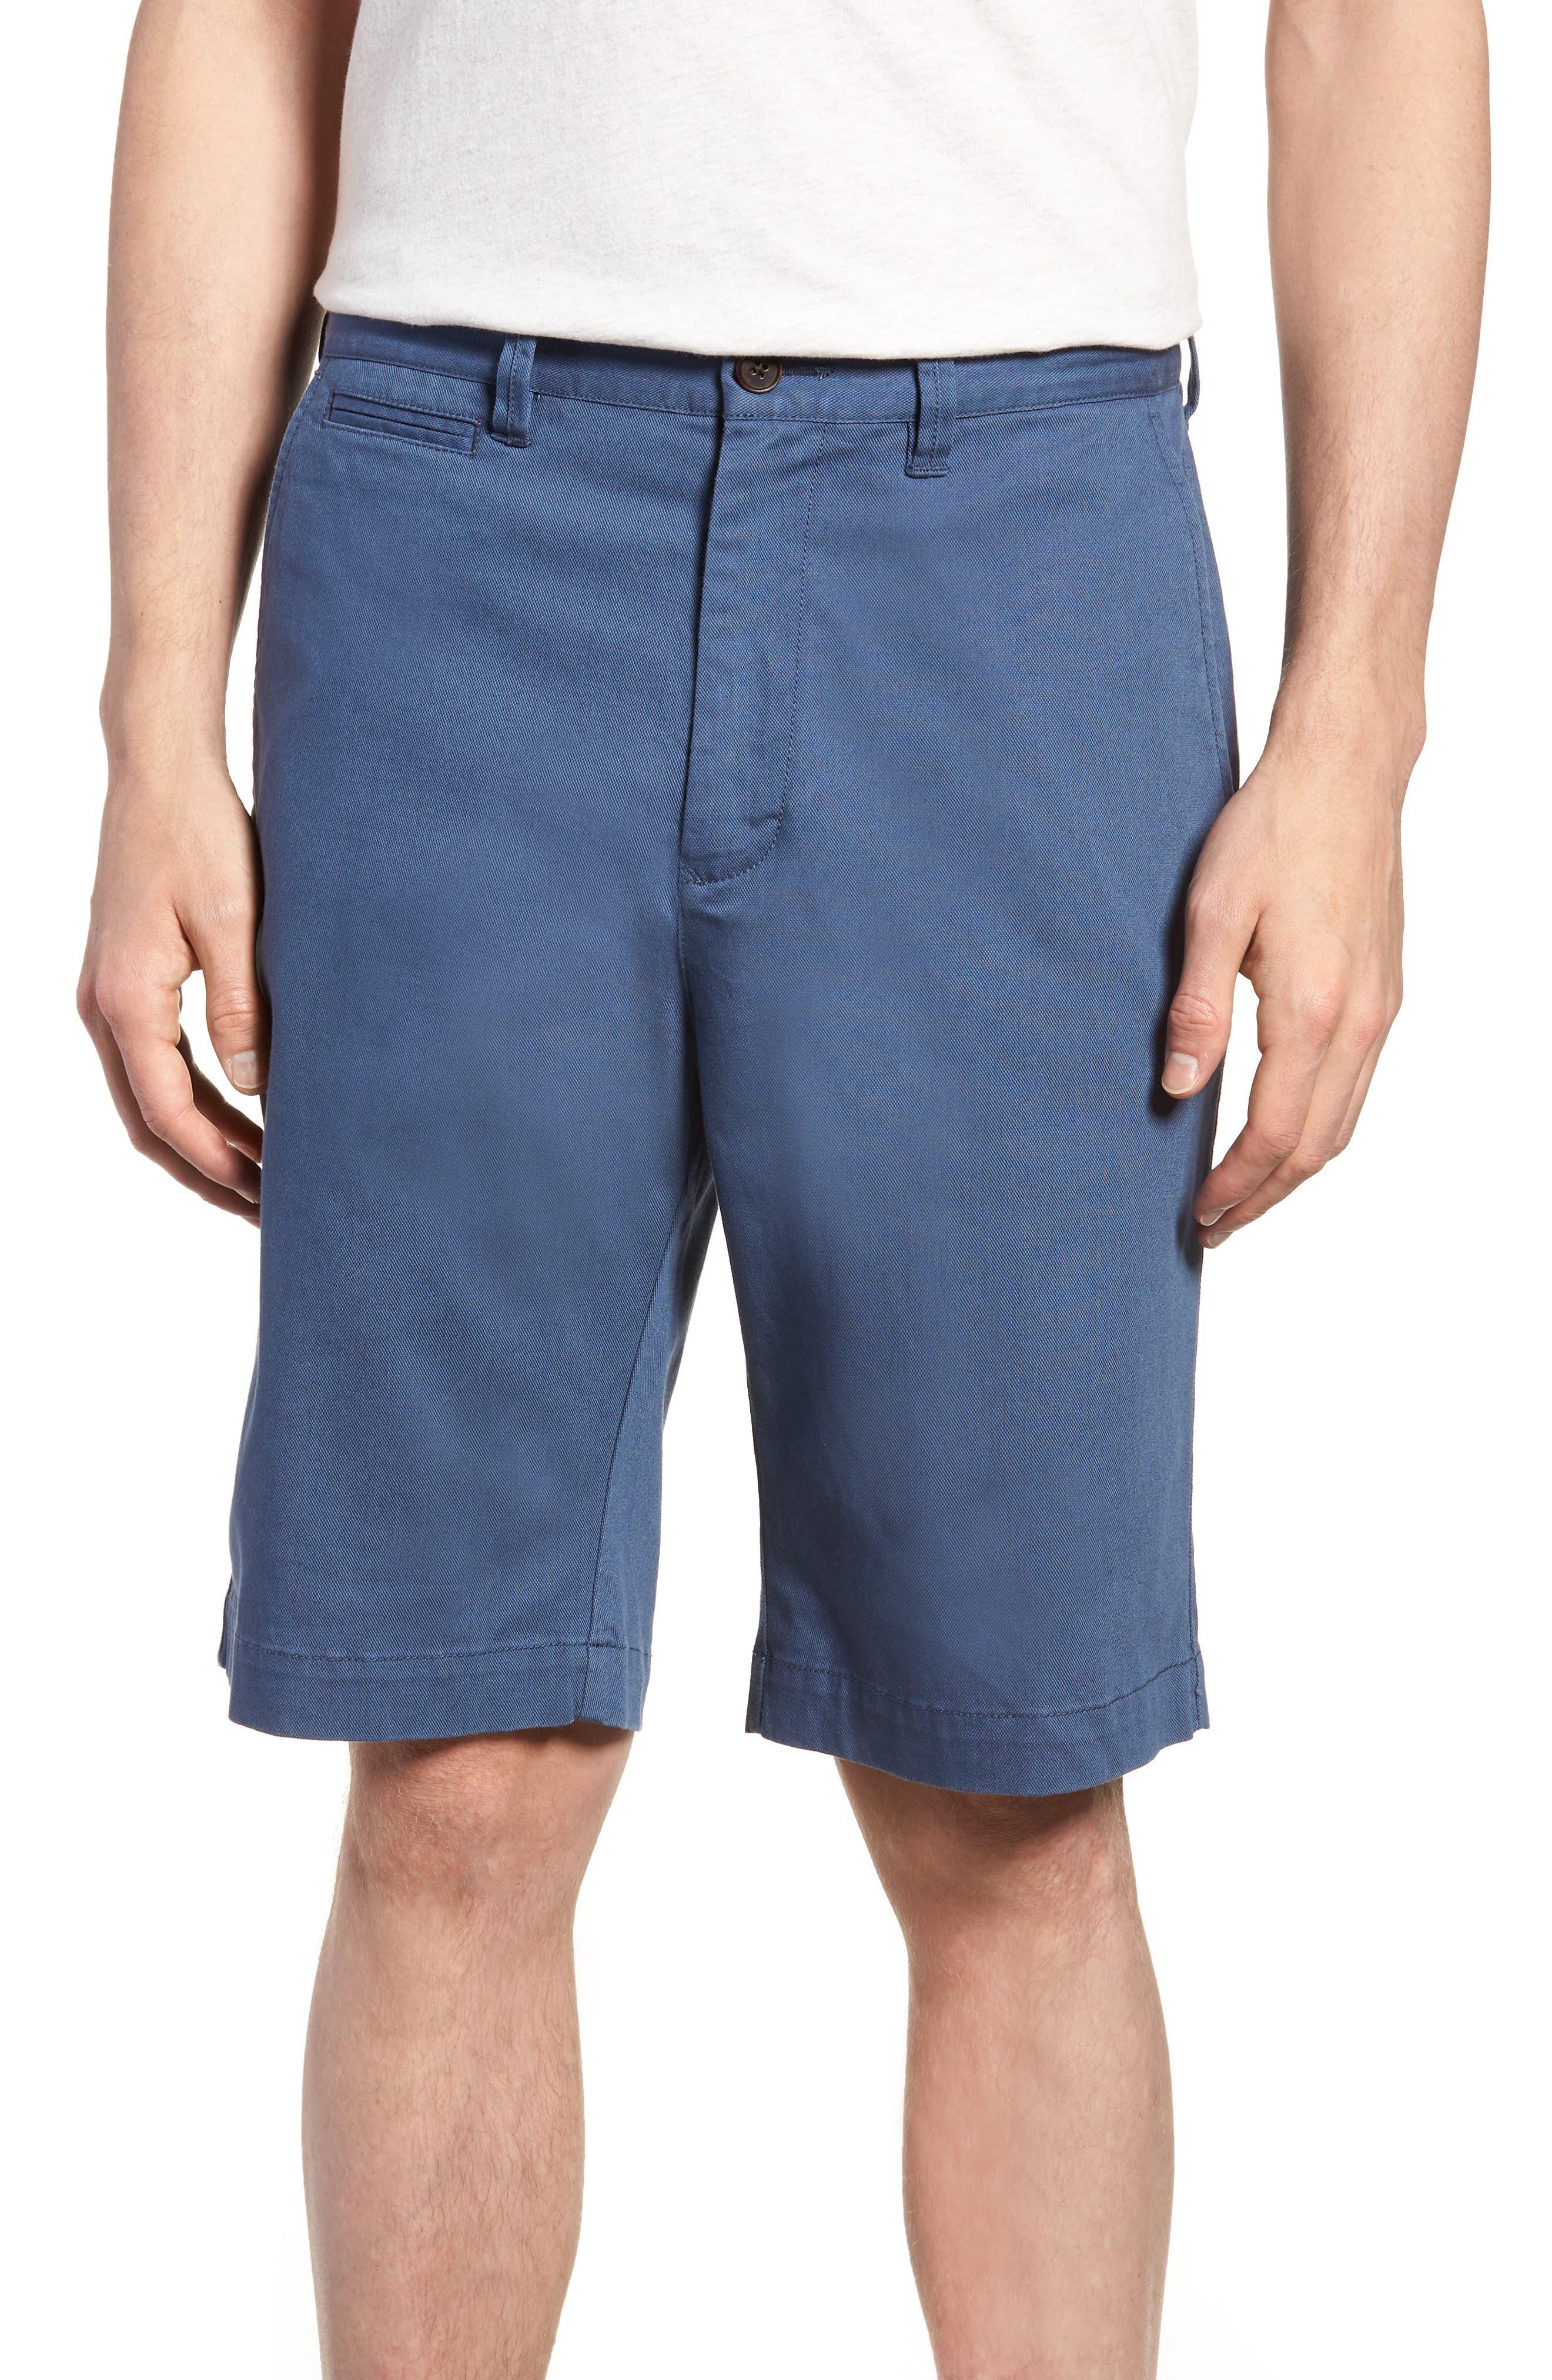 Driving Creek Regular Fit Flat Front Shorts,                         Main,                         color, 020